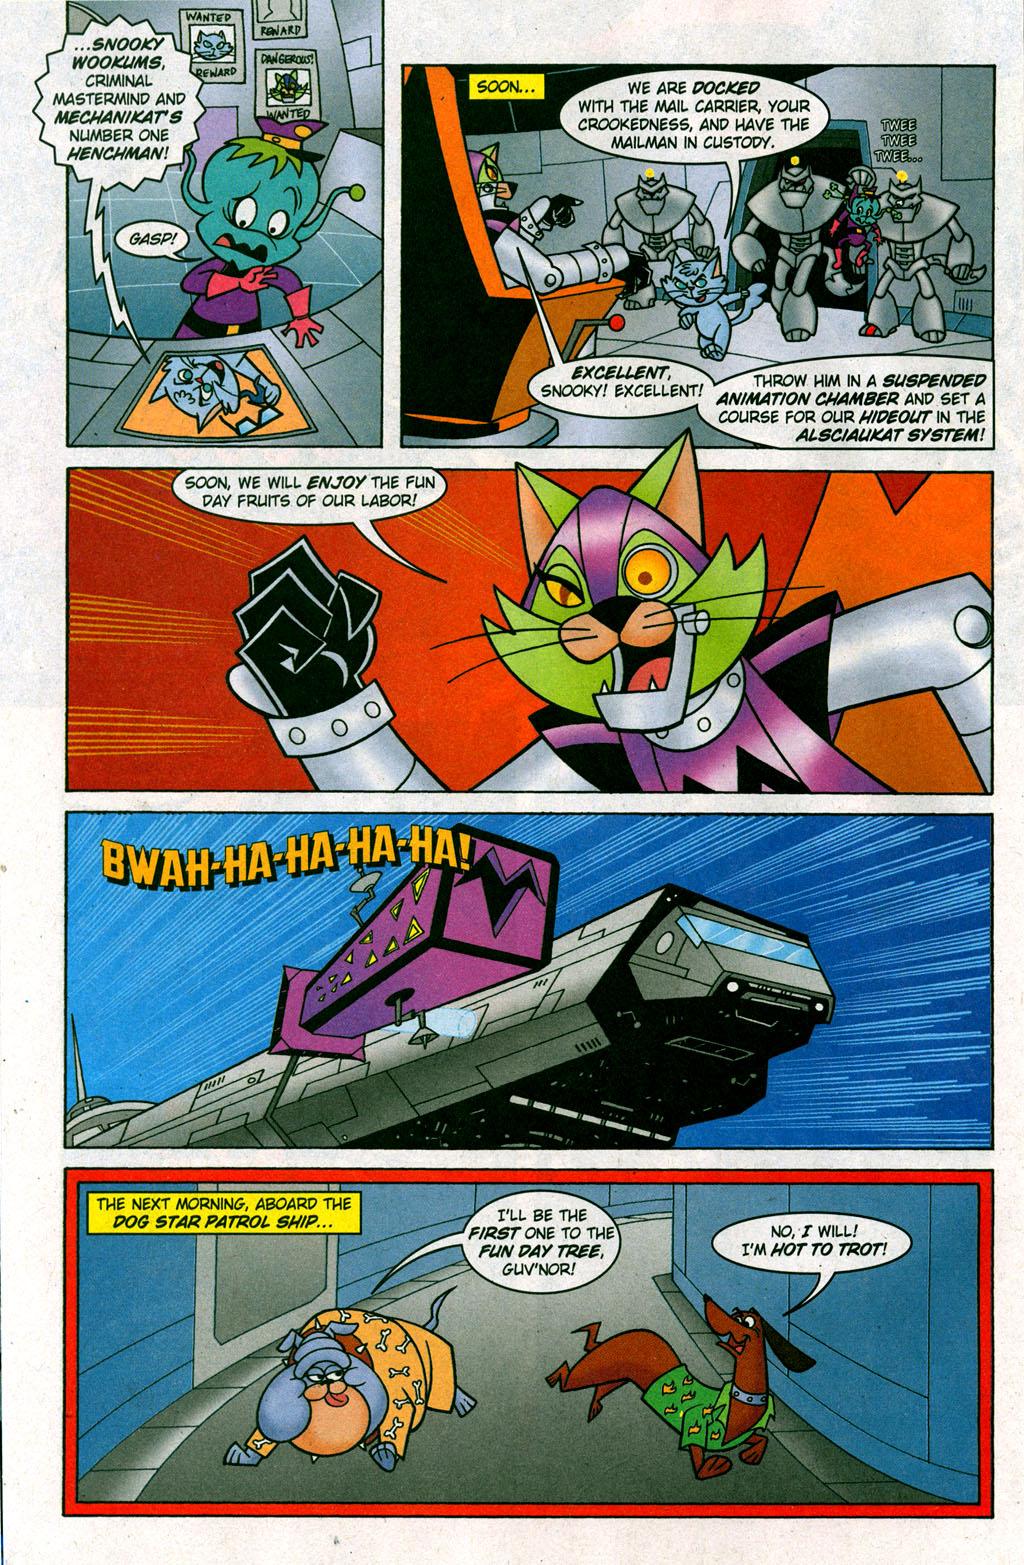 Read online Krypto the Superdog comic -  Issue #6 - 5